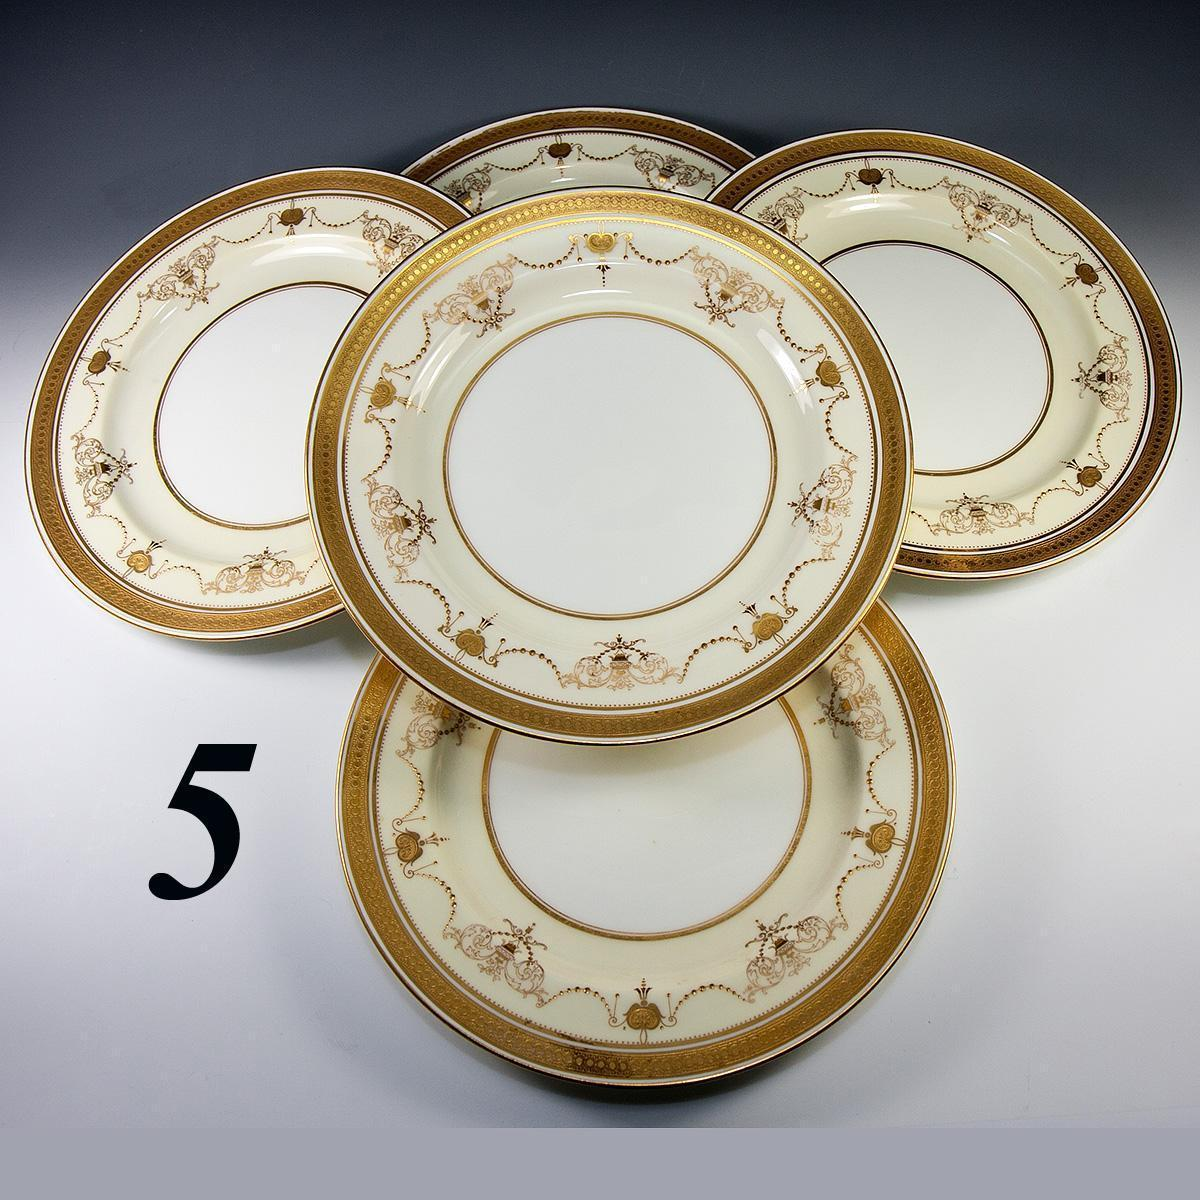 Antique Minton Dinner Plate Set 5pc Raised Encrusted Gold